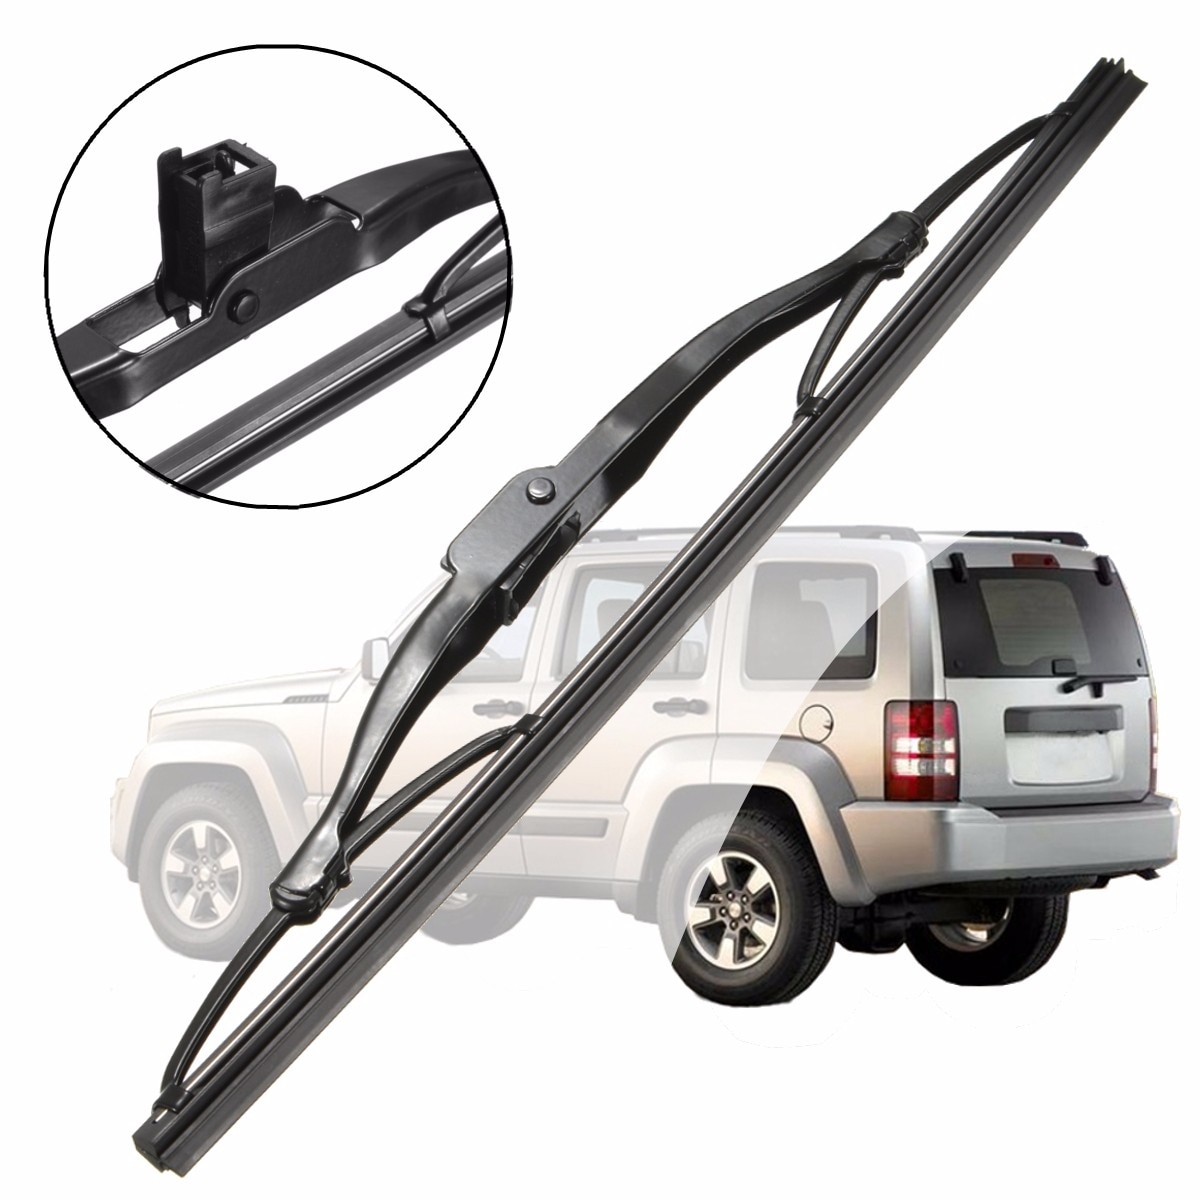 11 pulgadas 28cm coche trasera de vidrio escobilla limpiaparabrisas reemplazo para Jeep libertad para Dodge calibre 2002-2013